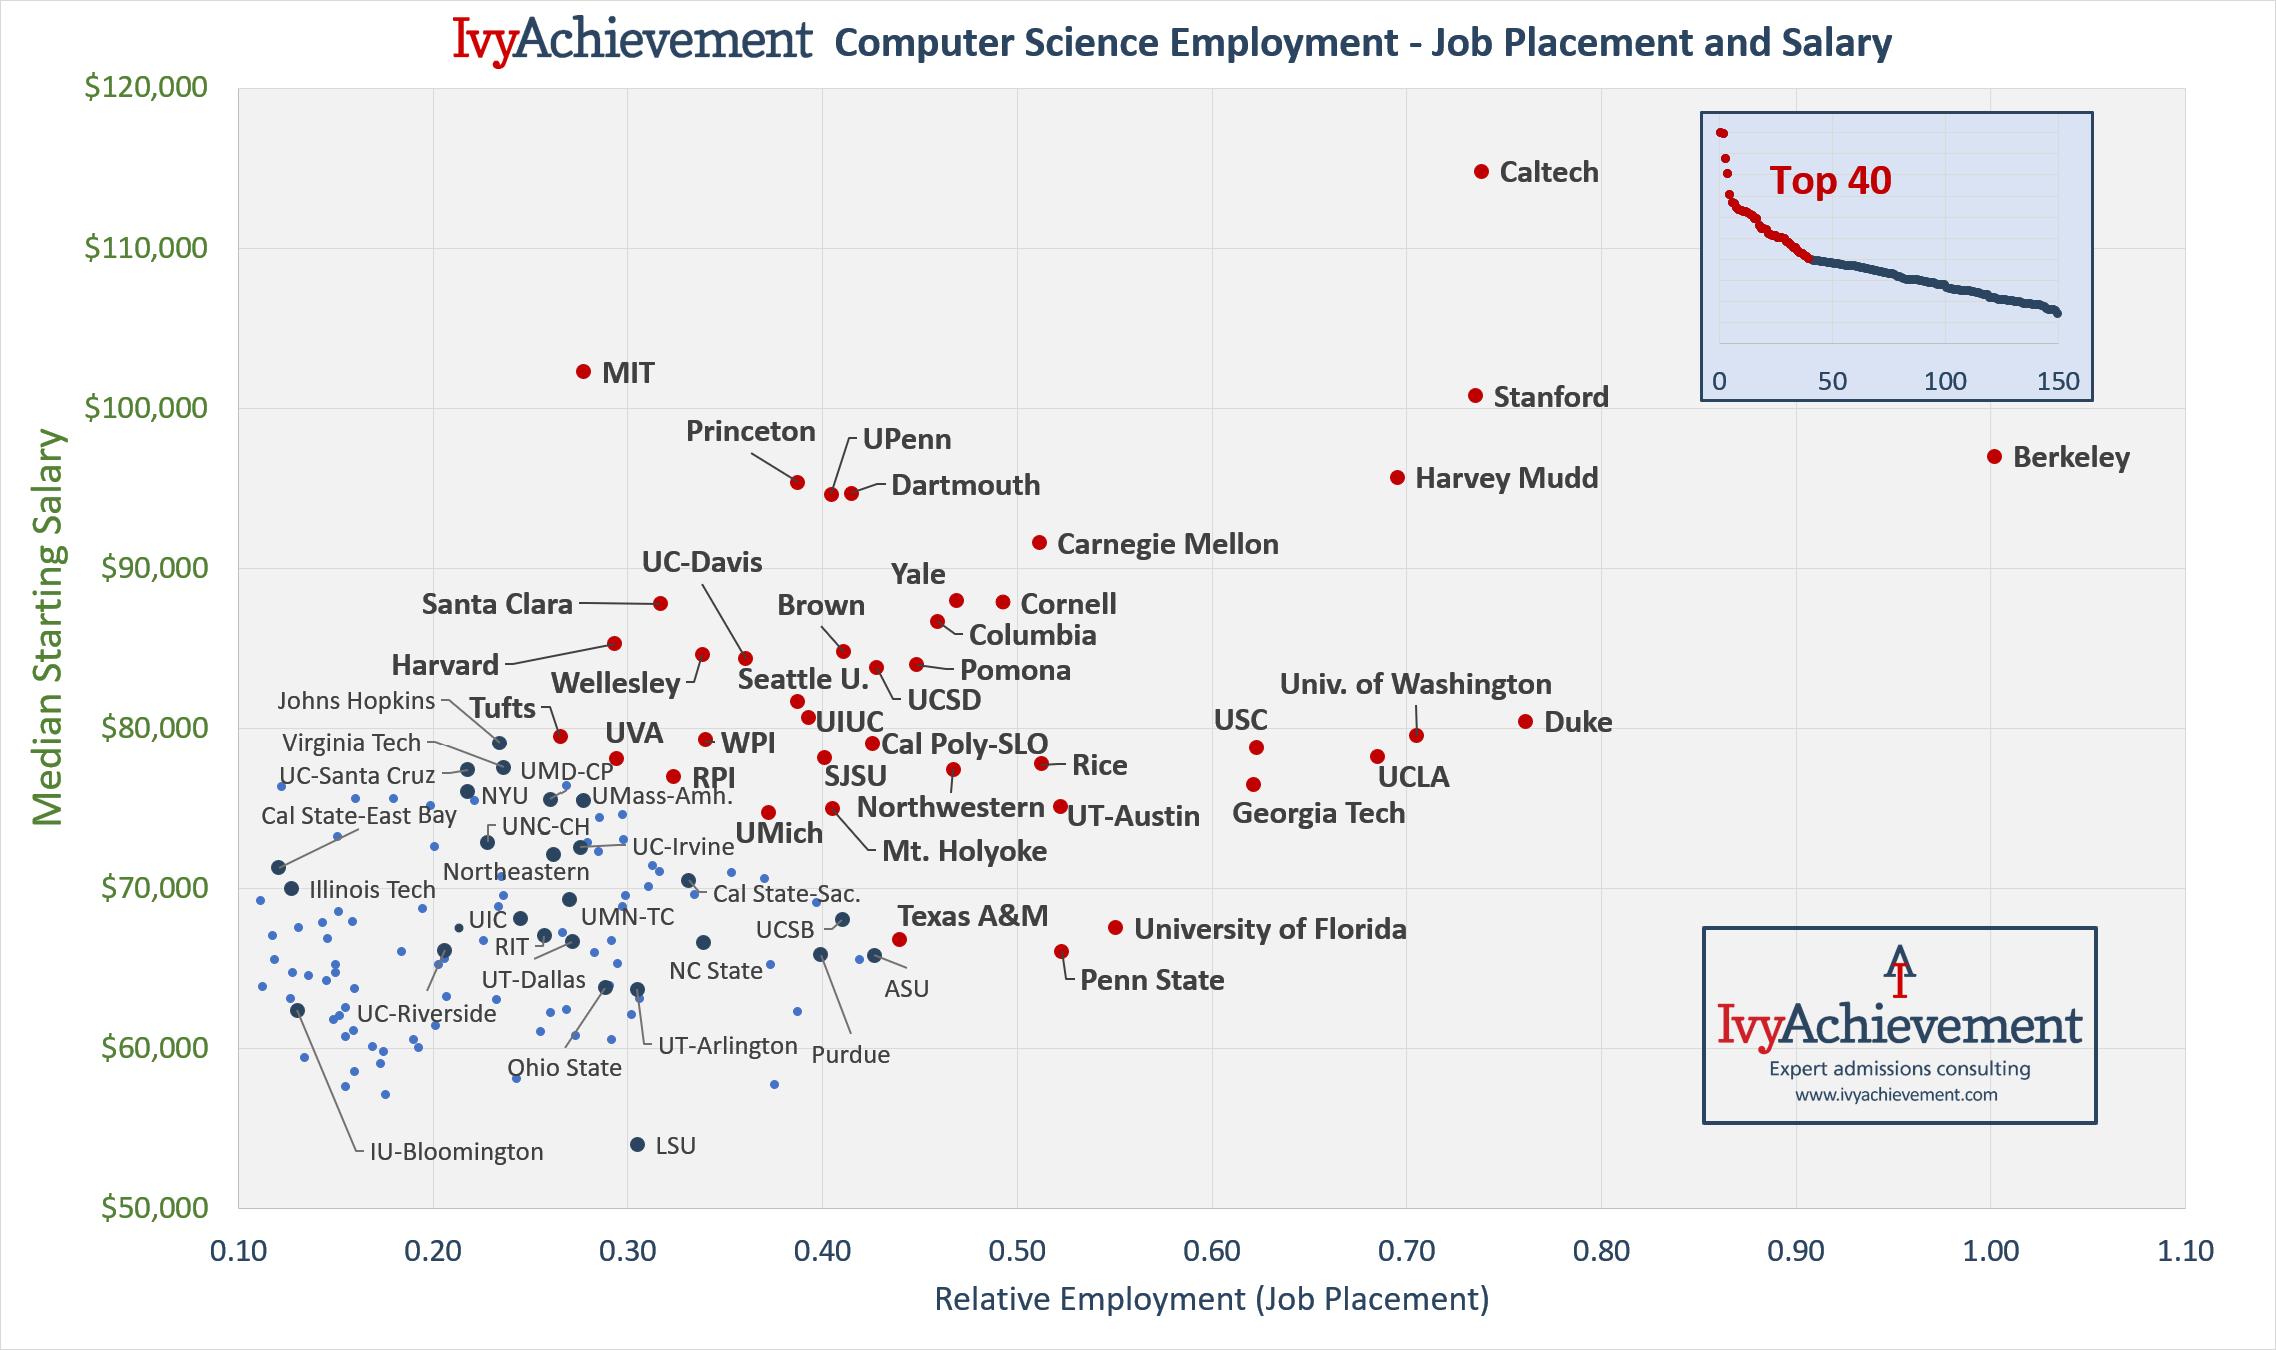 IvyAchievement CS Employment - relative vs salary